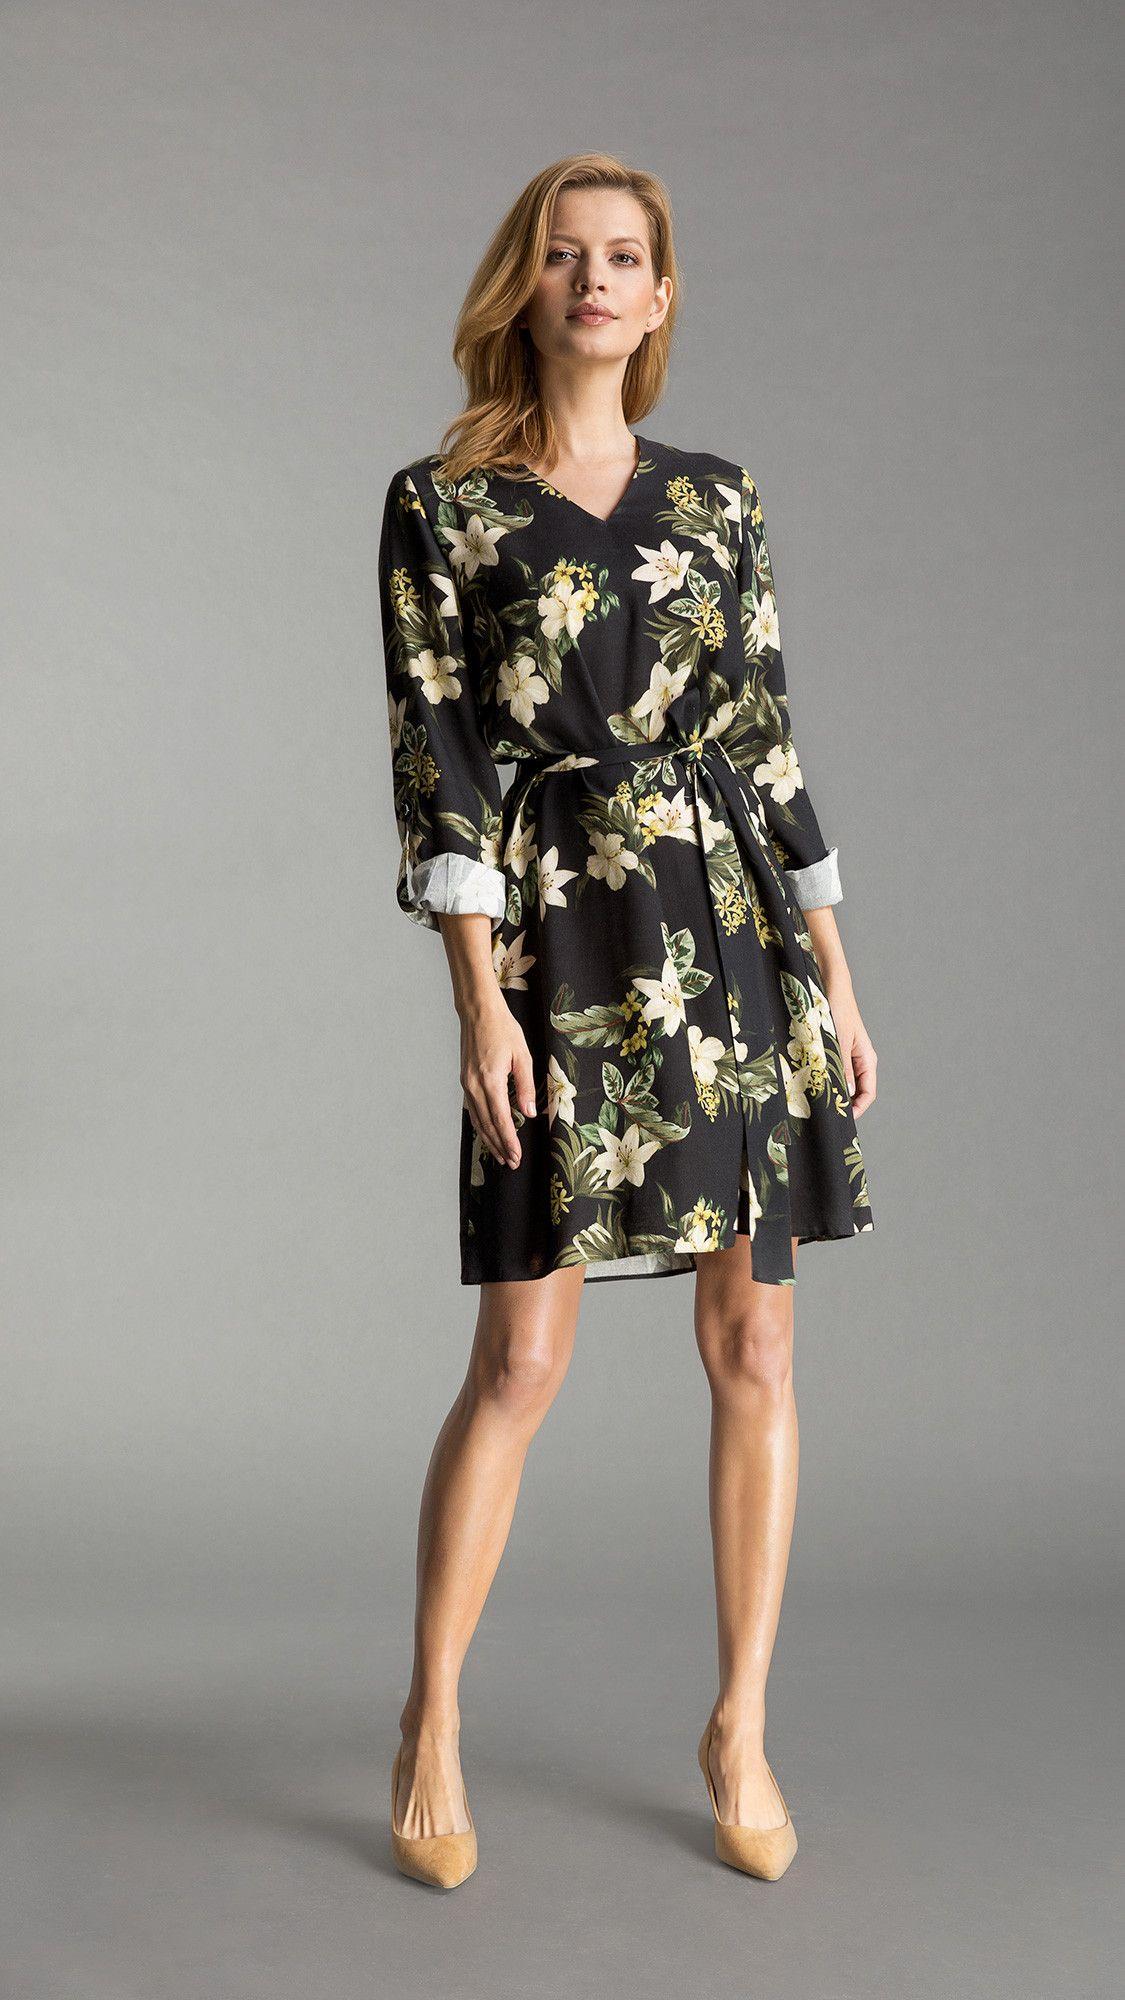 Dress Nicole Floral Black